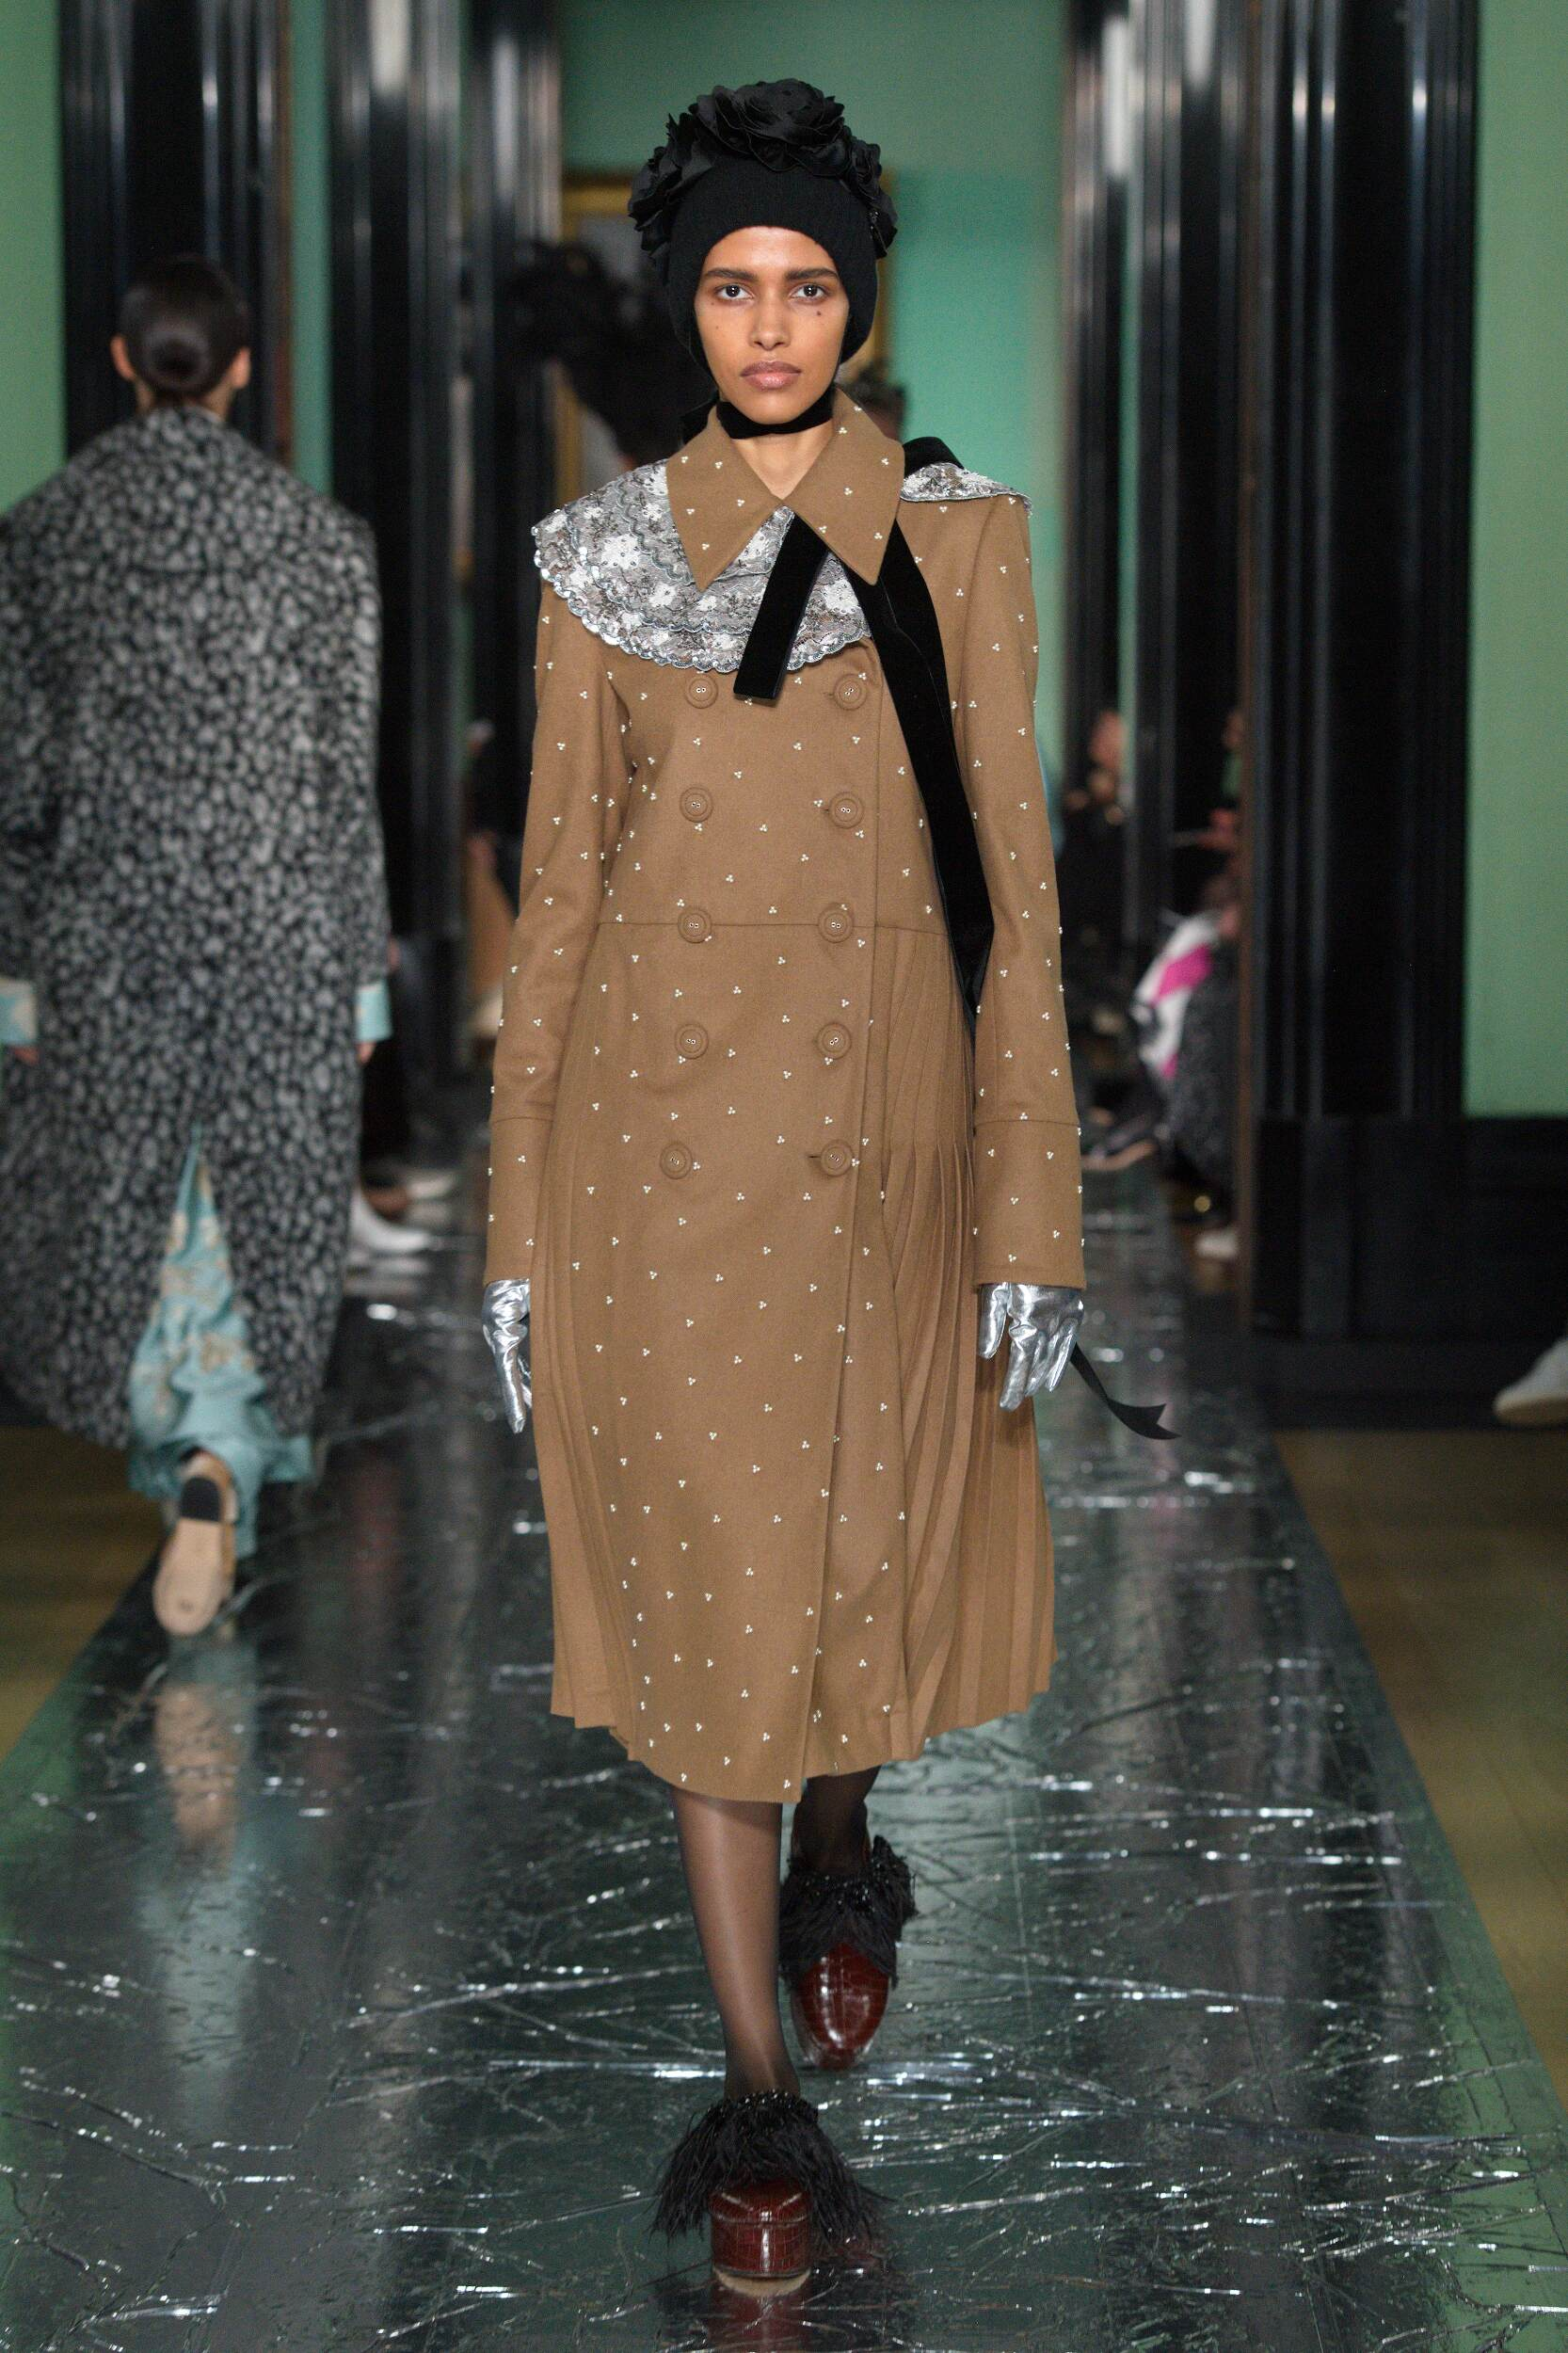 Runway Erdem Fall Winter 2020 Women's Collection London Fashion Week